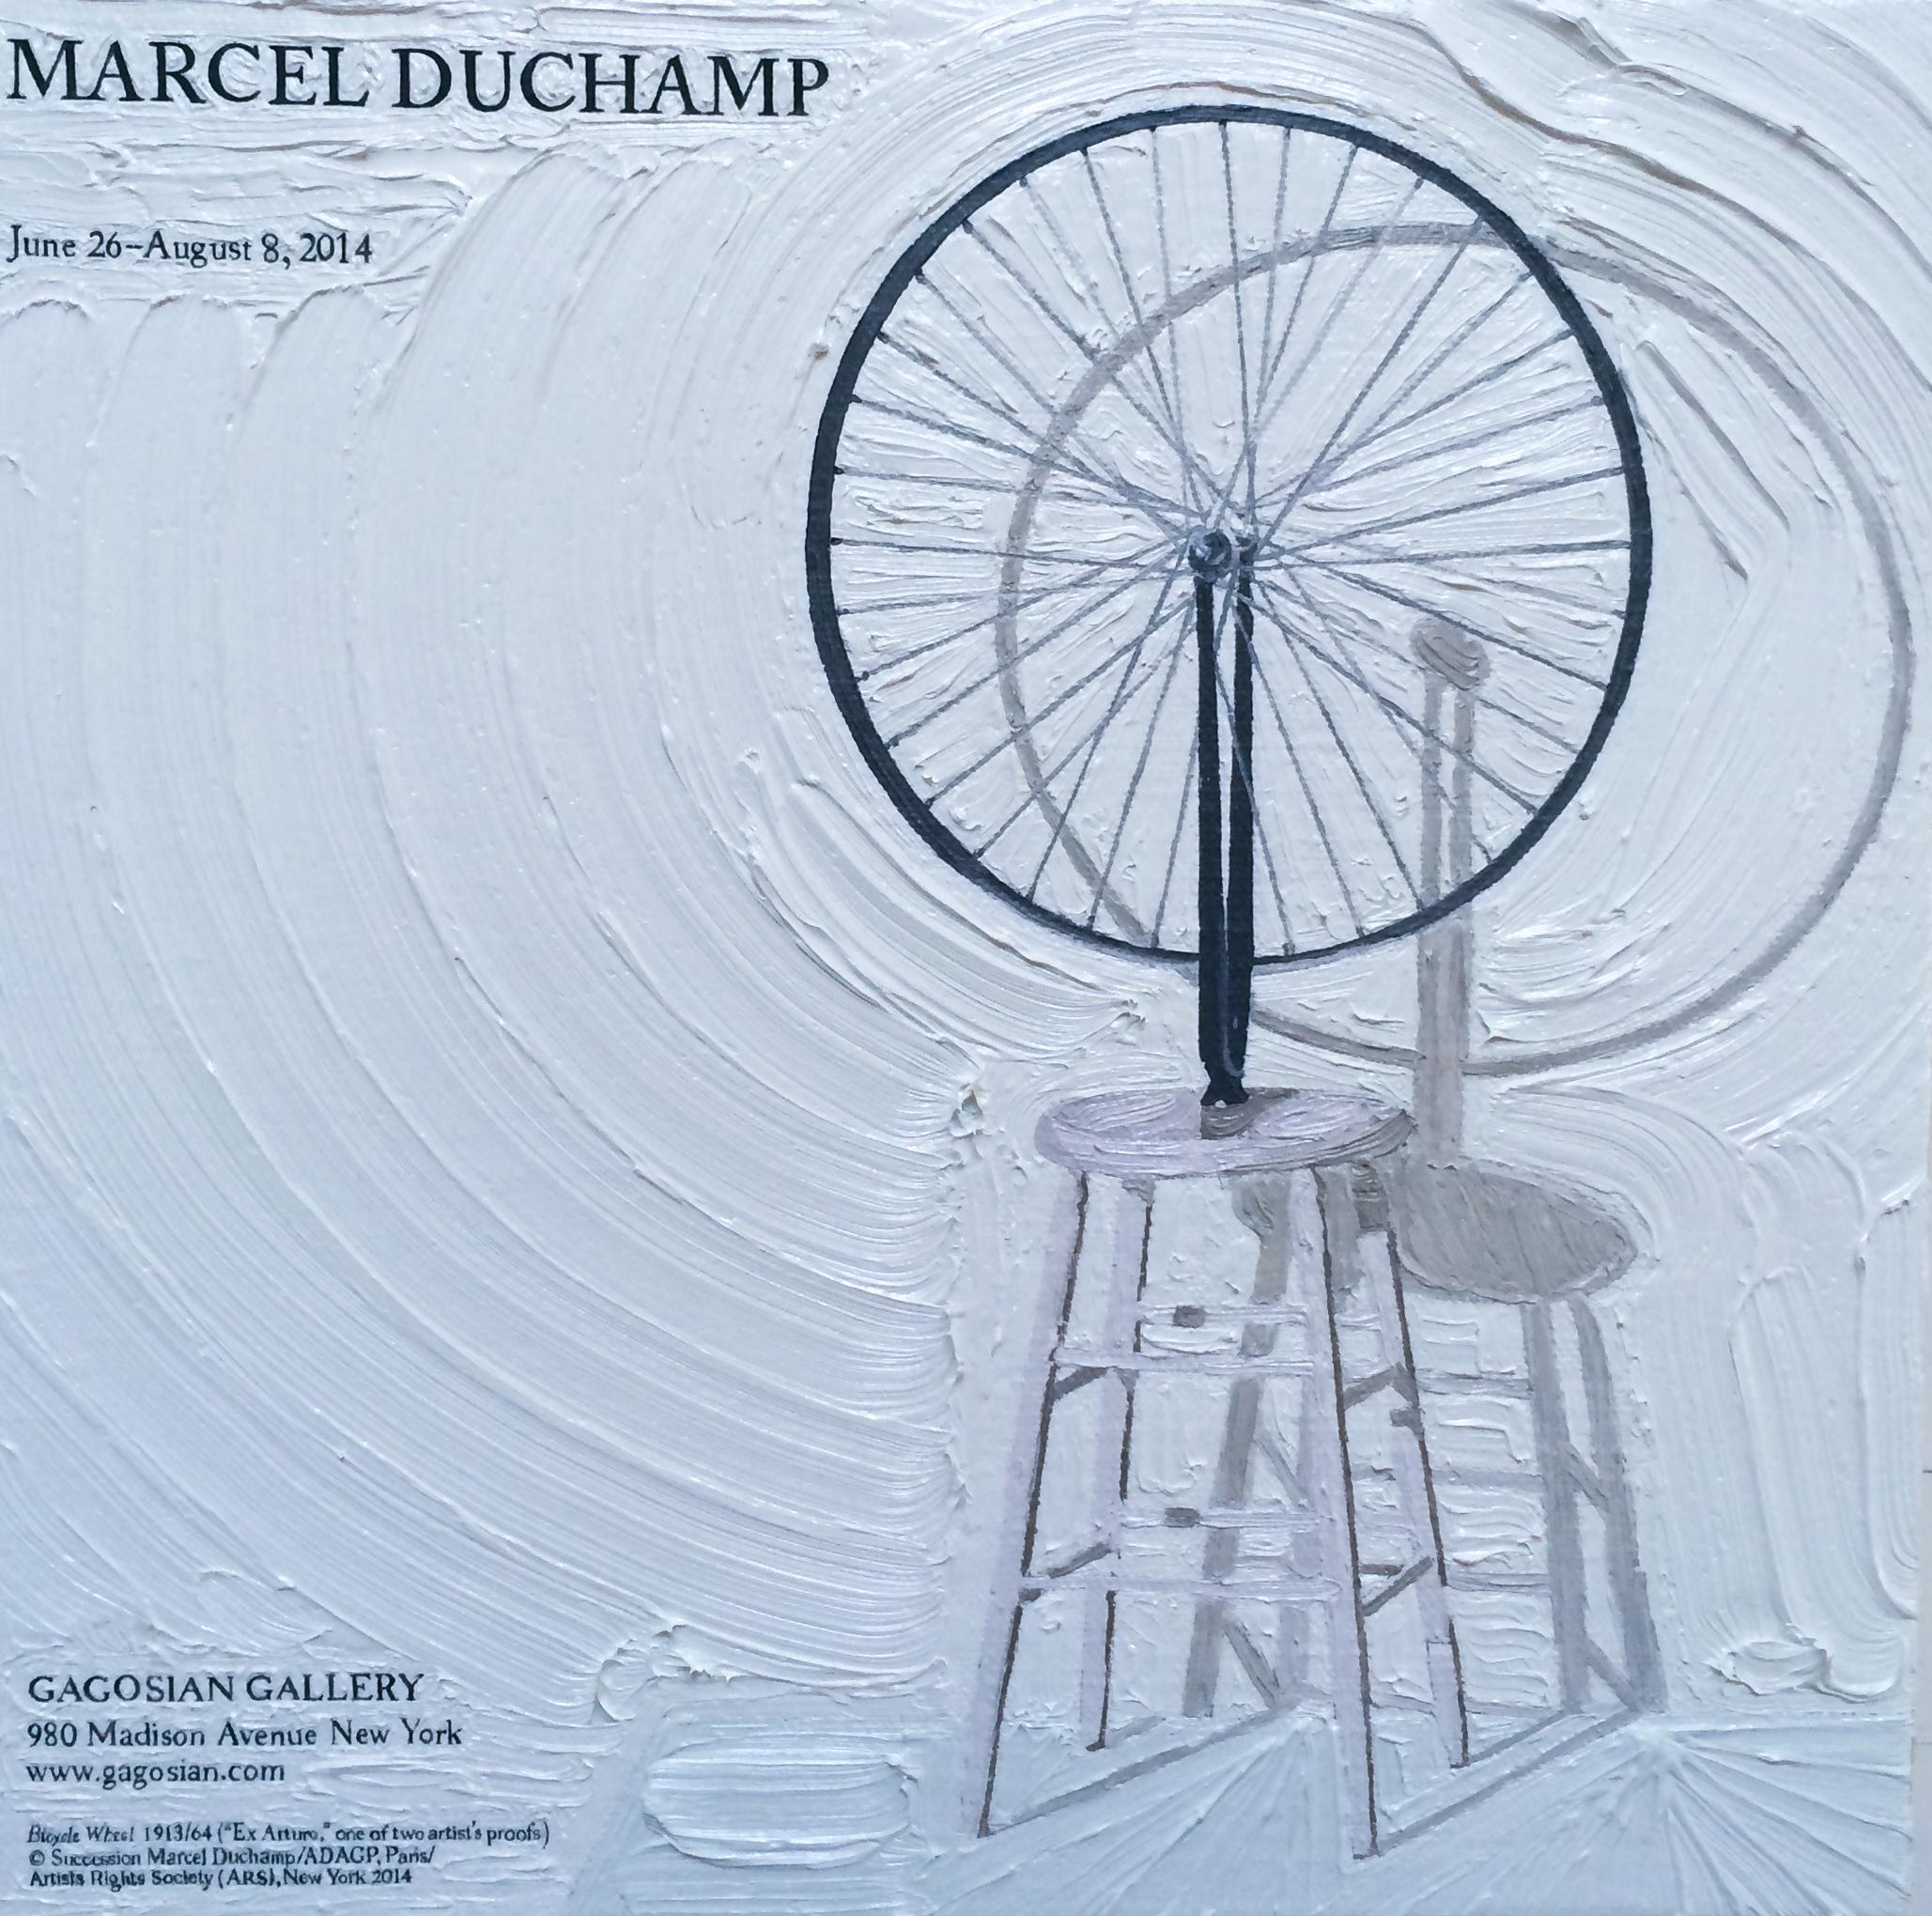 Marcel Duchamp at Gagosian